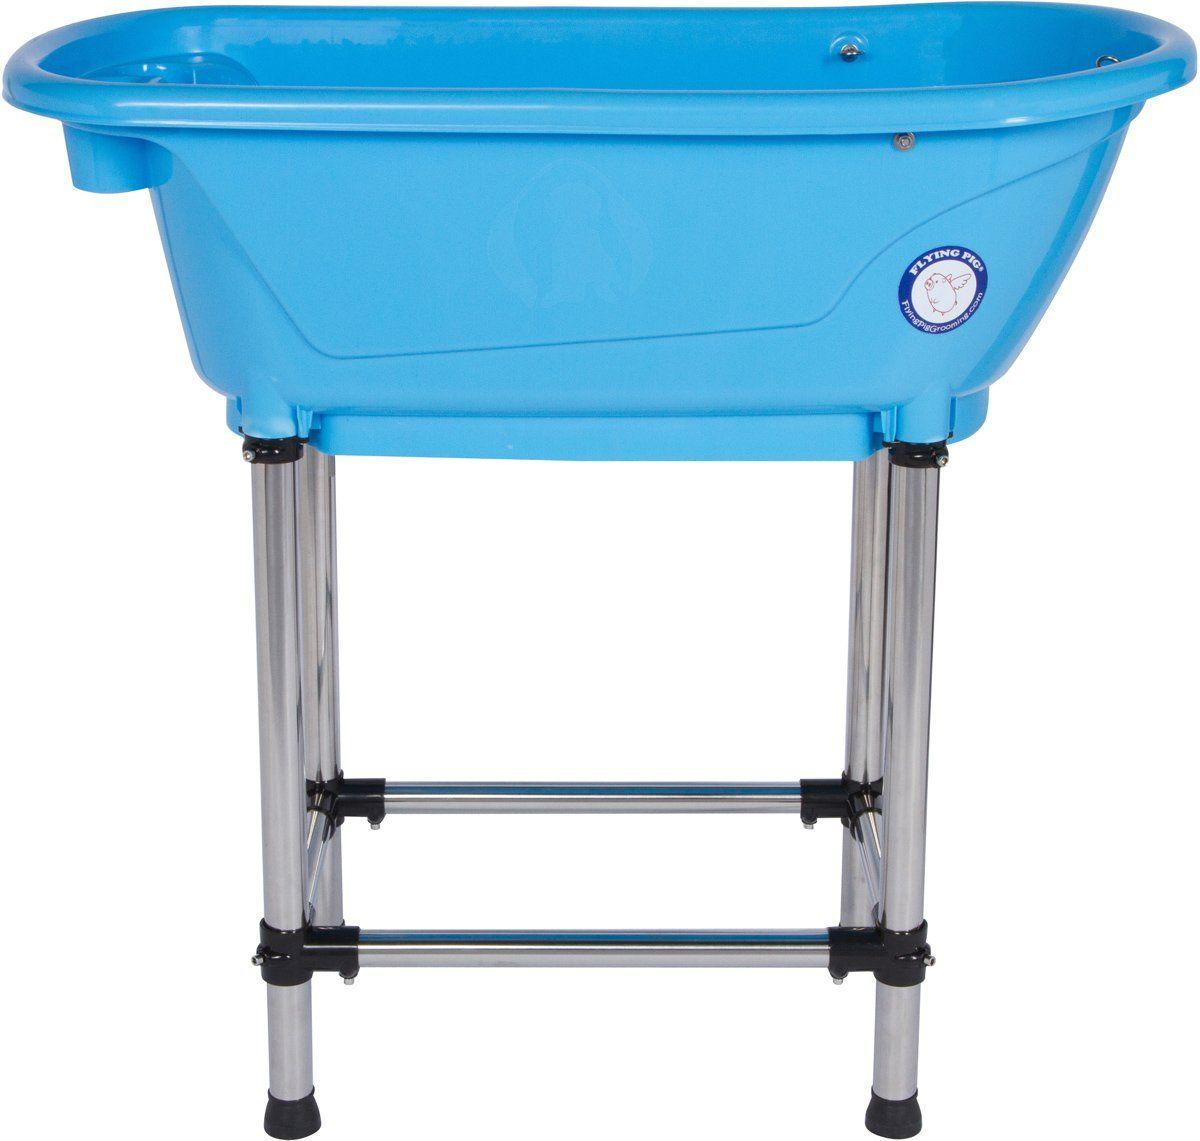 Flying Pig Pet Dog Cat Washing Shower Grooming Portable Bath Tub